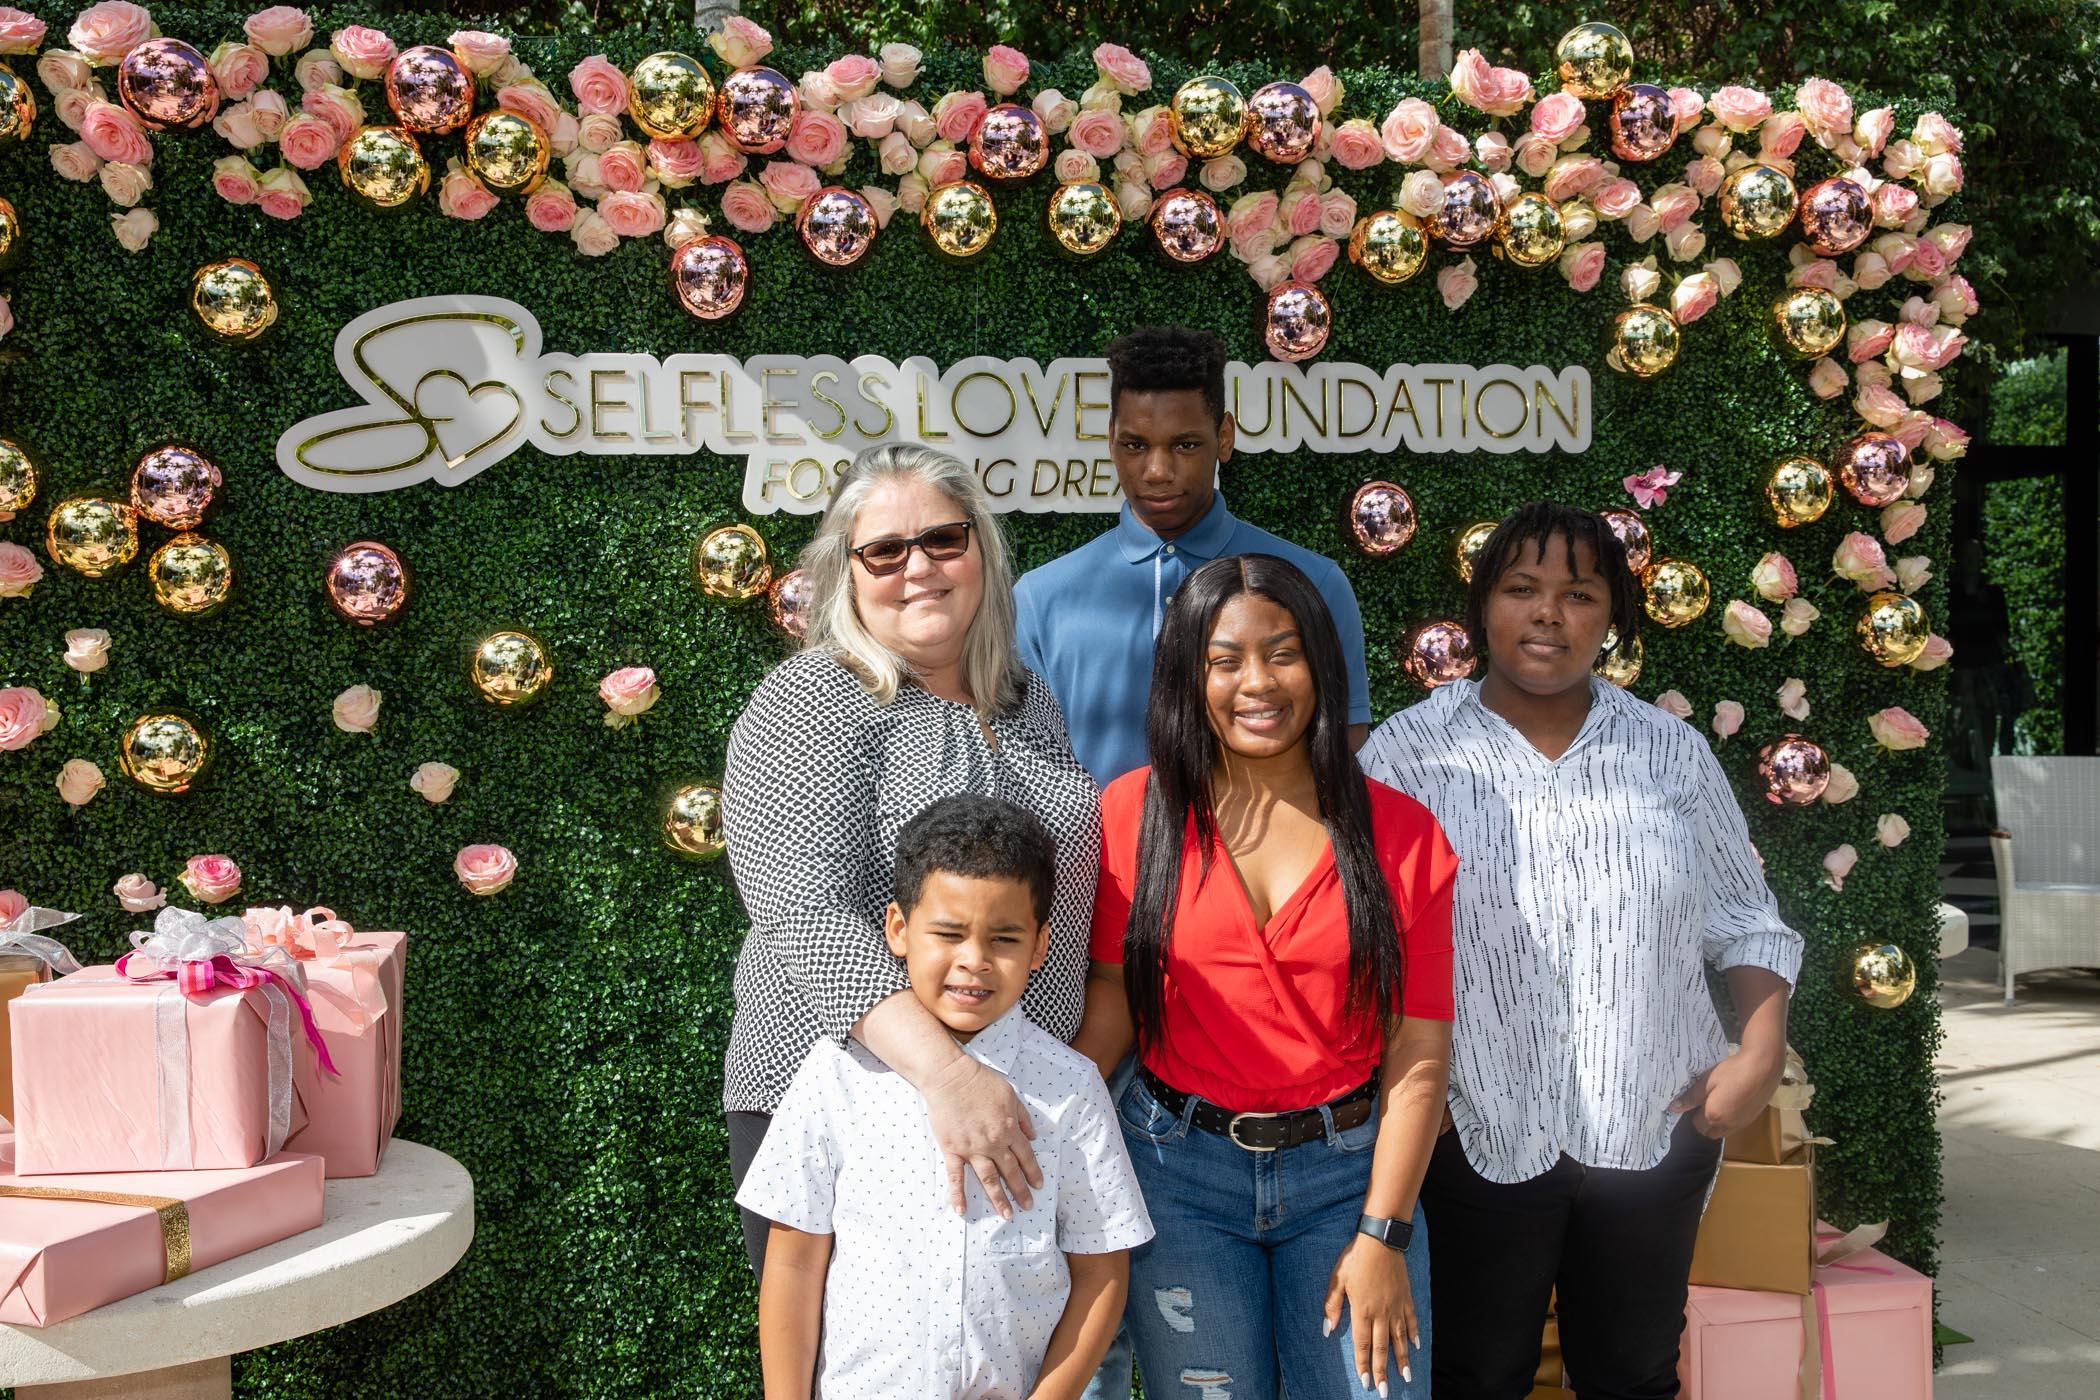 selfless-love-foundation-adoption-day-family